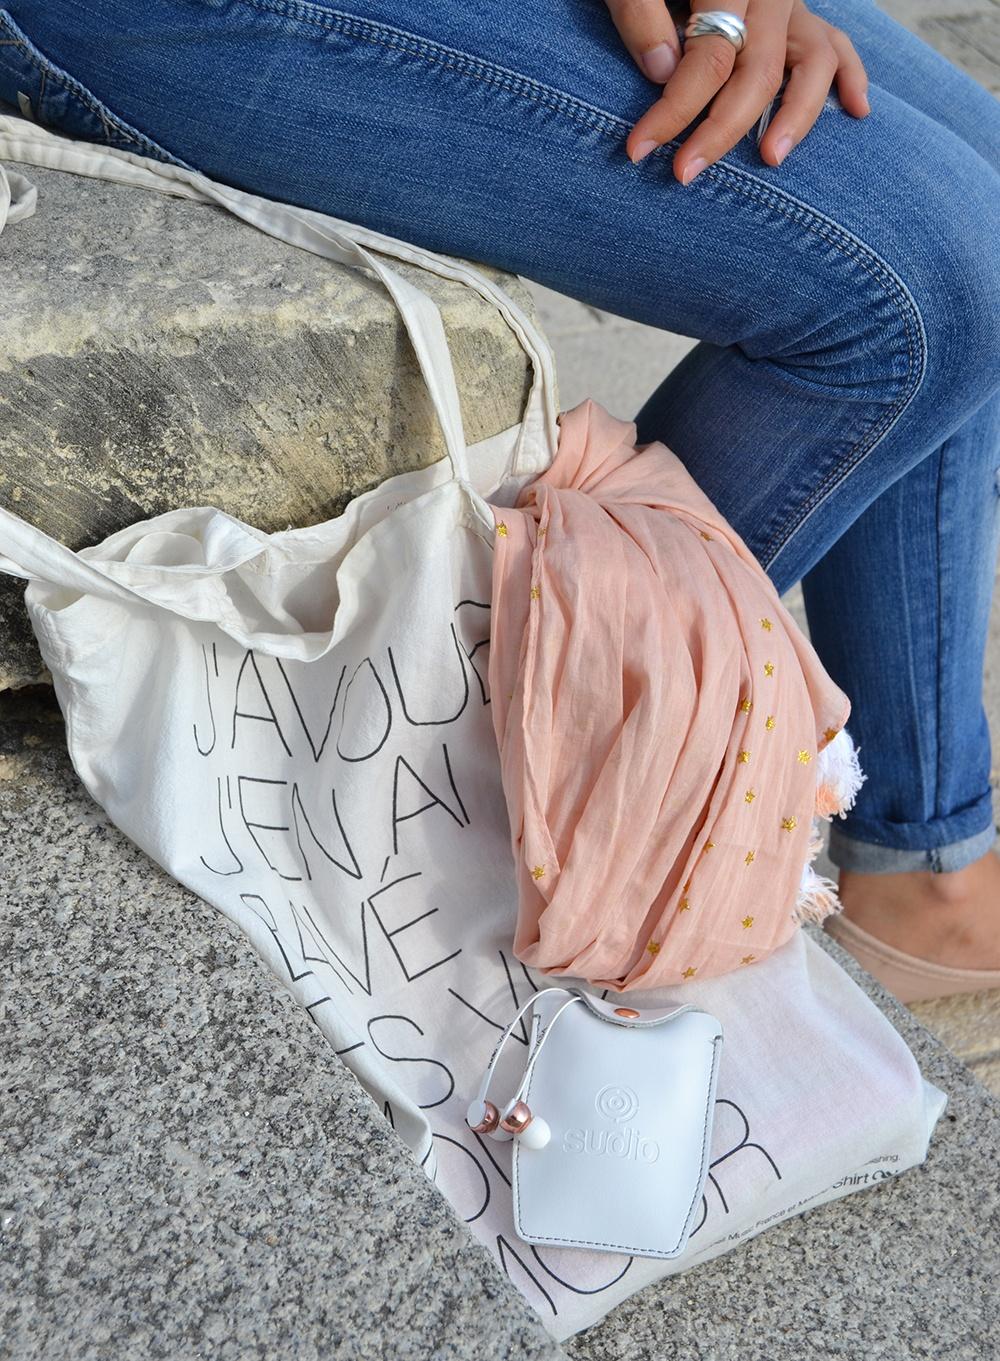 Top-dentelle-rose-pastel-shein-ecouteurs-sudio-sweden-3